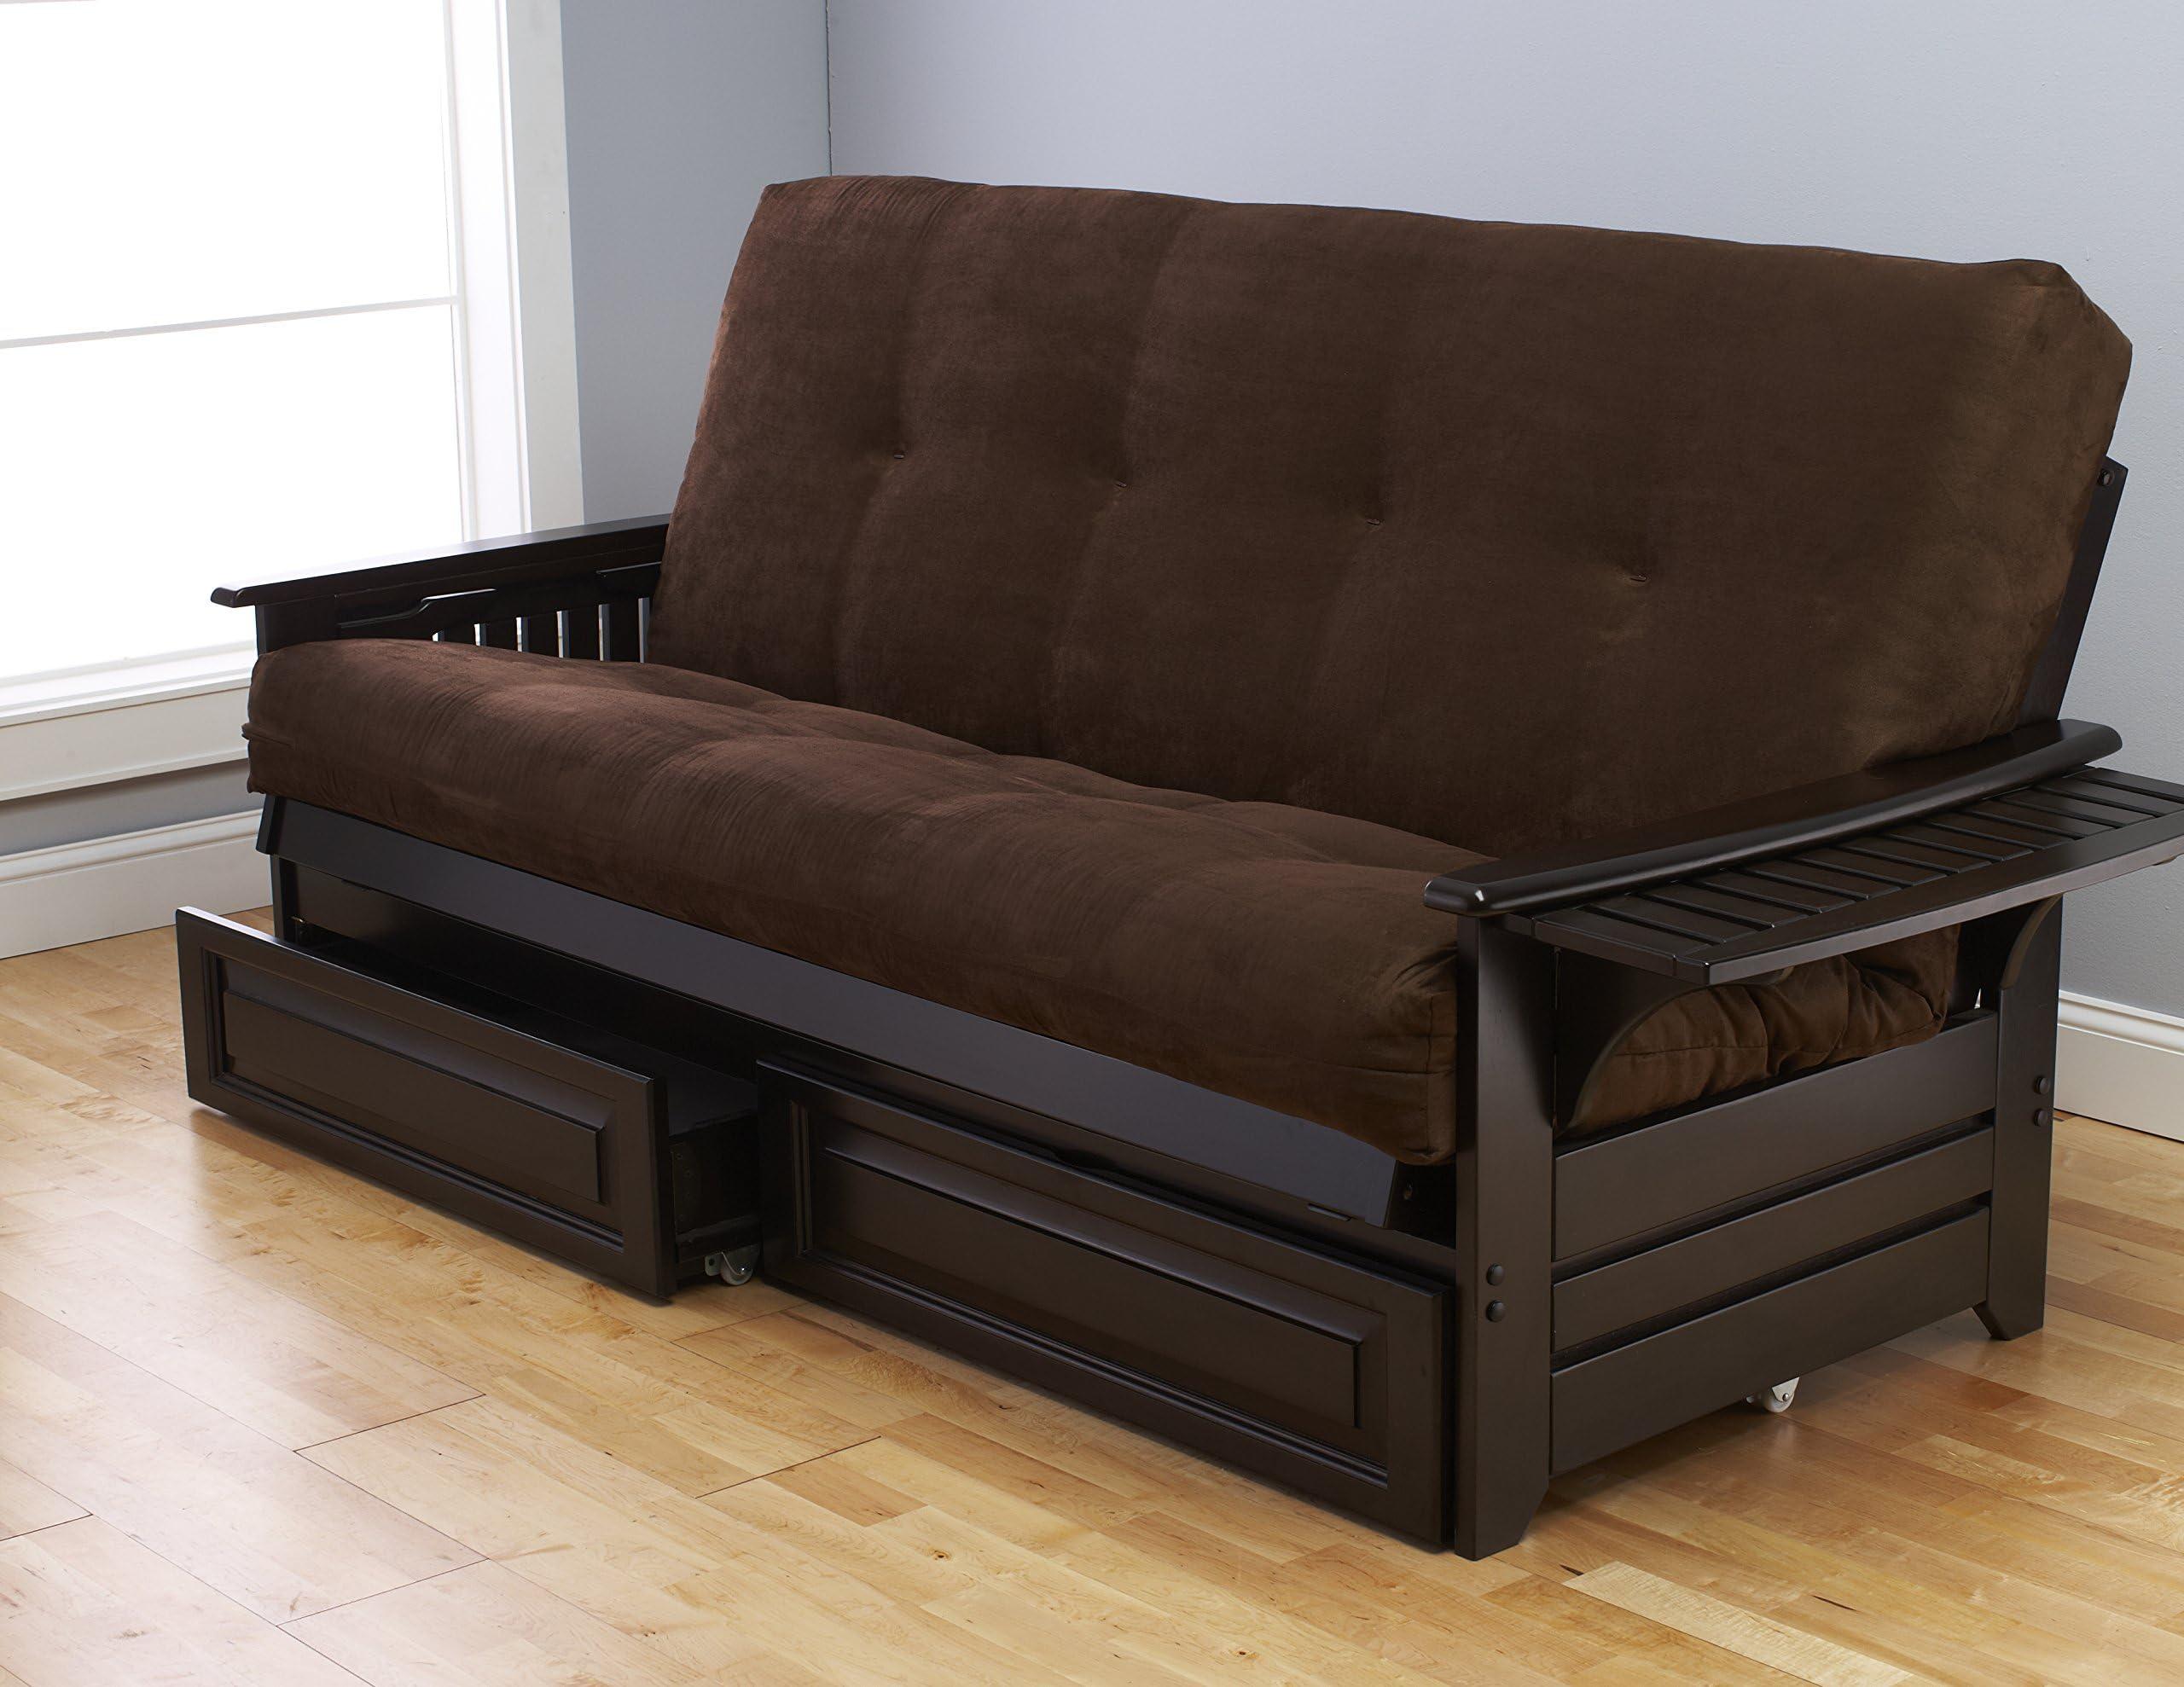 phoenix espresso frame w  8 inch mattress microfiber suede futon set wood sofa bed   futons   amazon    rh   amazon